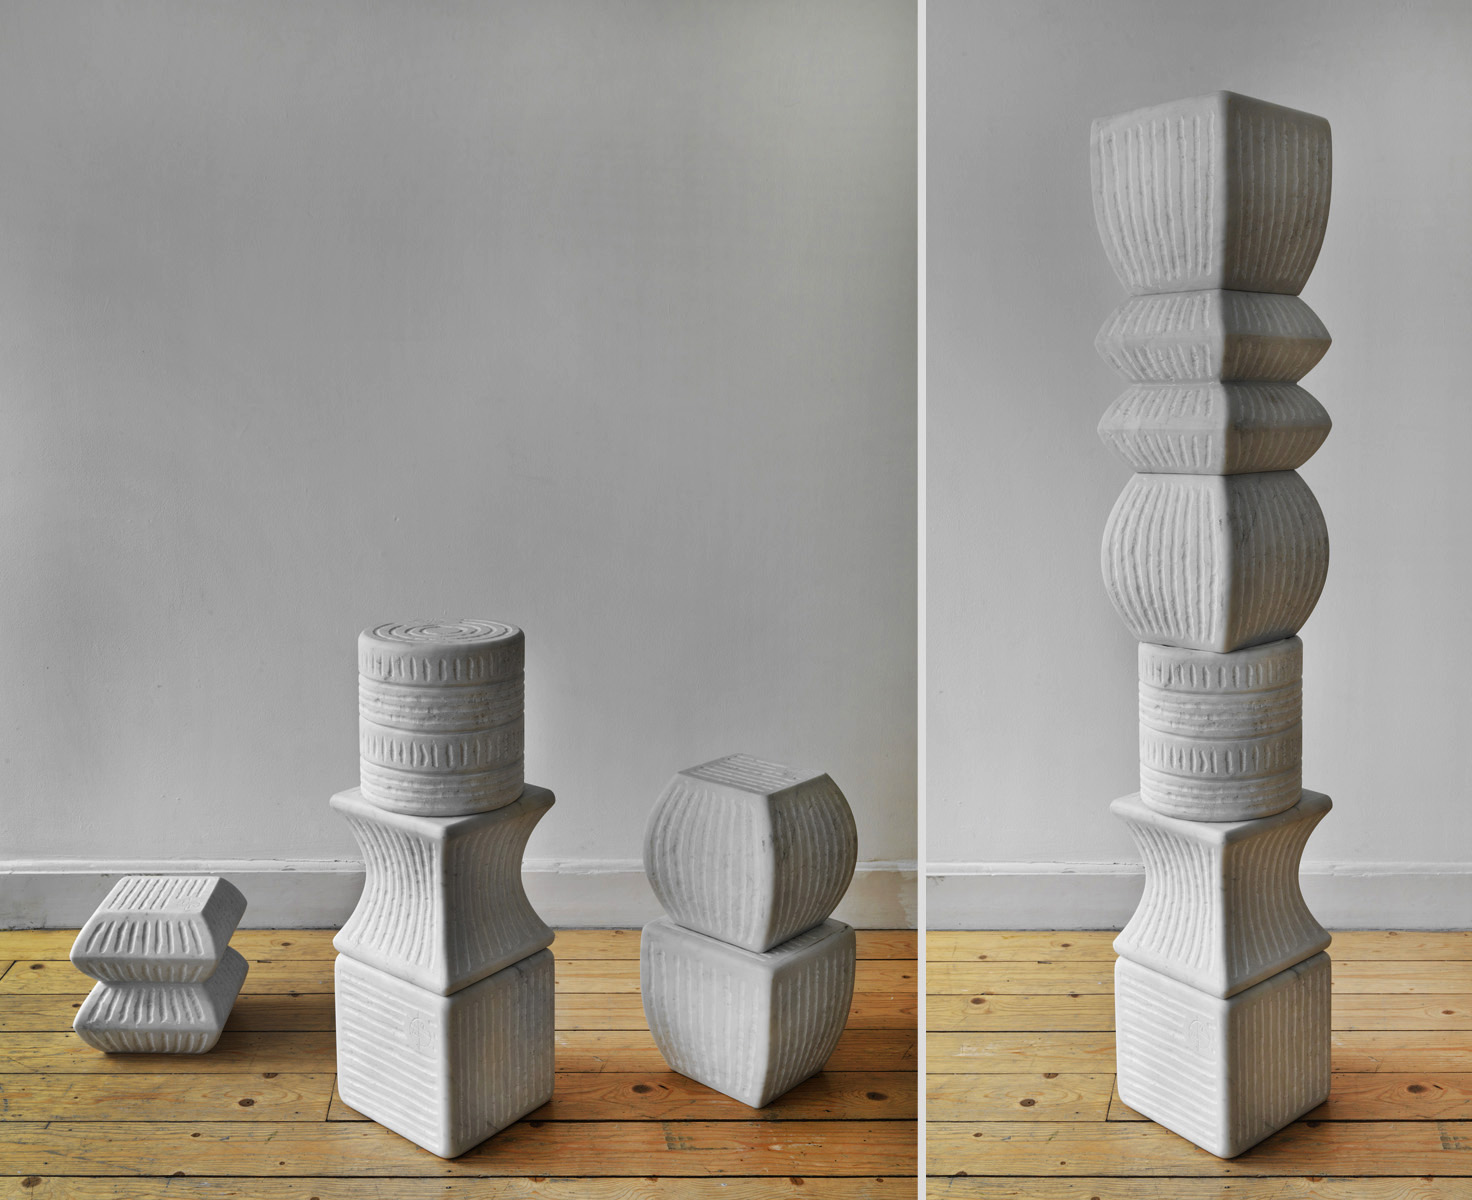 285-TOTEM  -2007  -marmo bianco Carrara  -H= 150 cm.